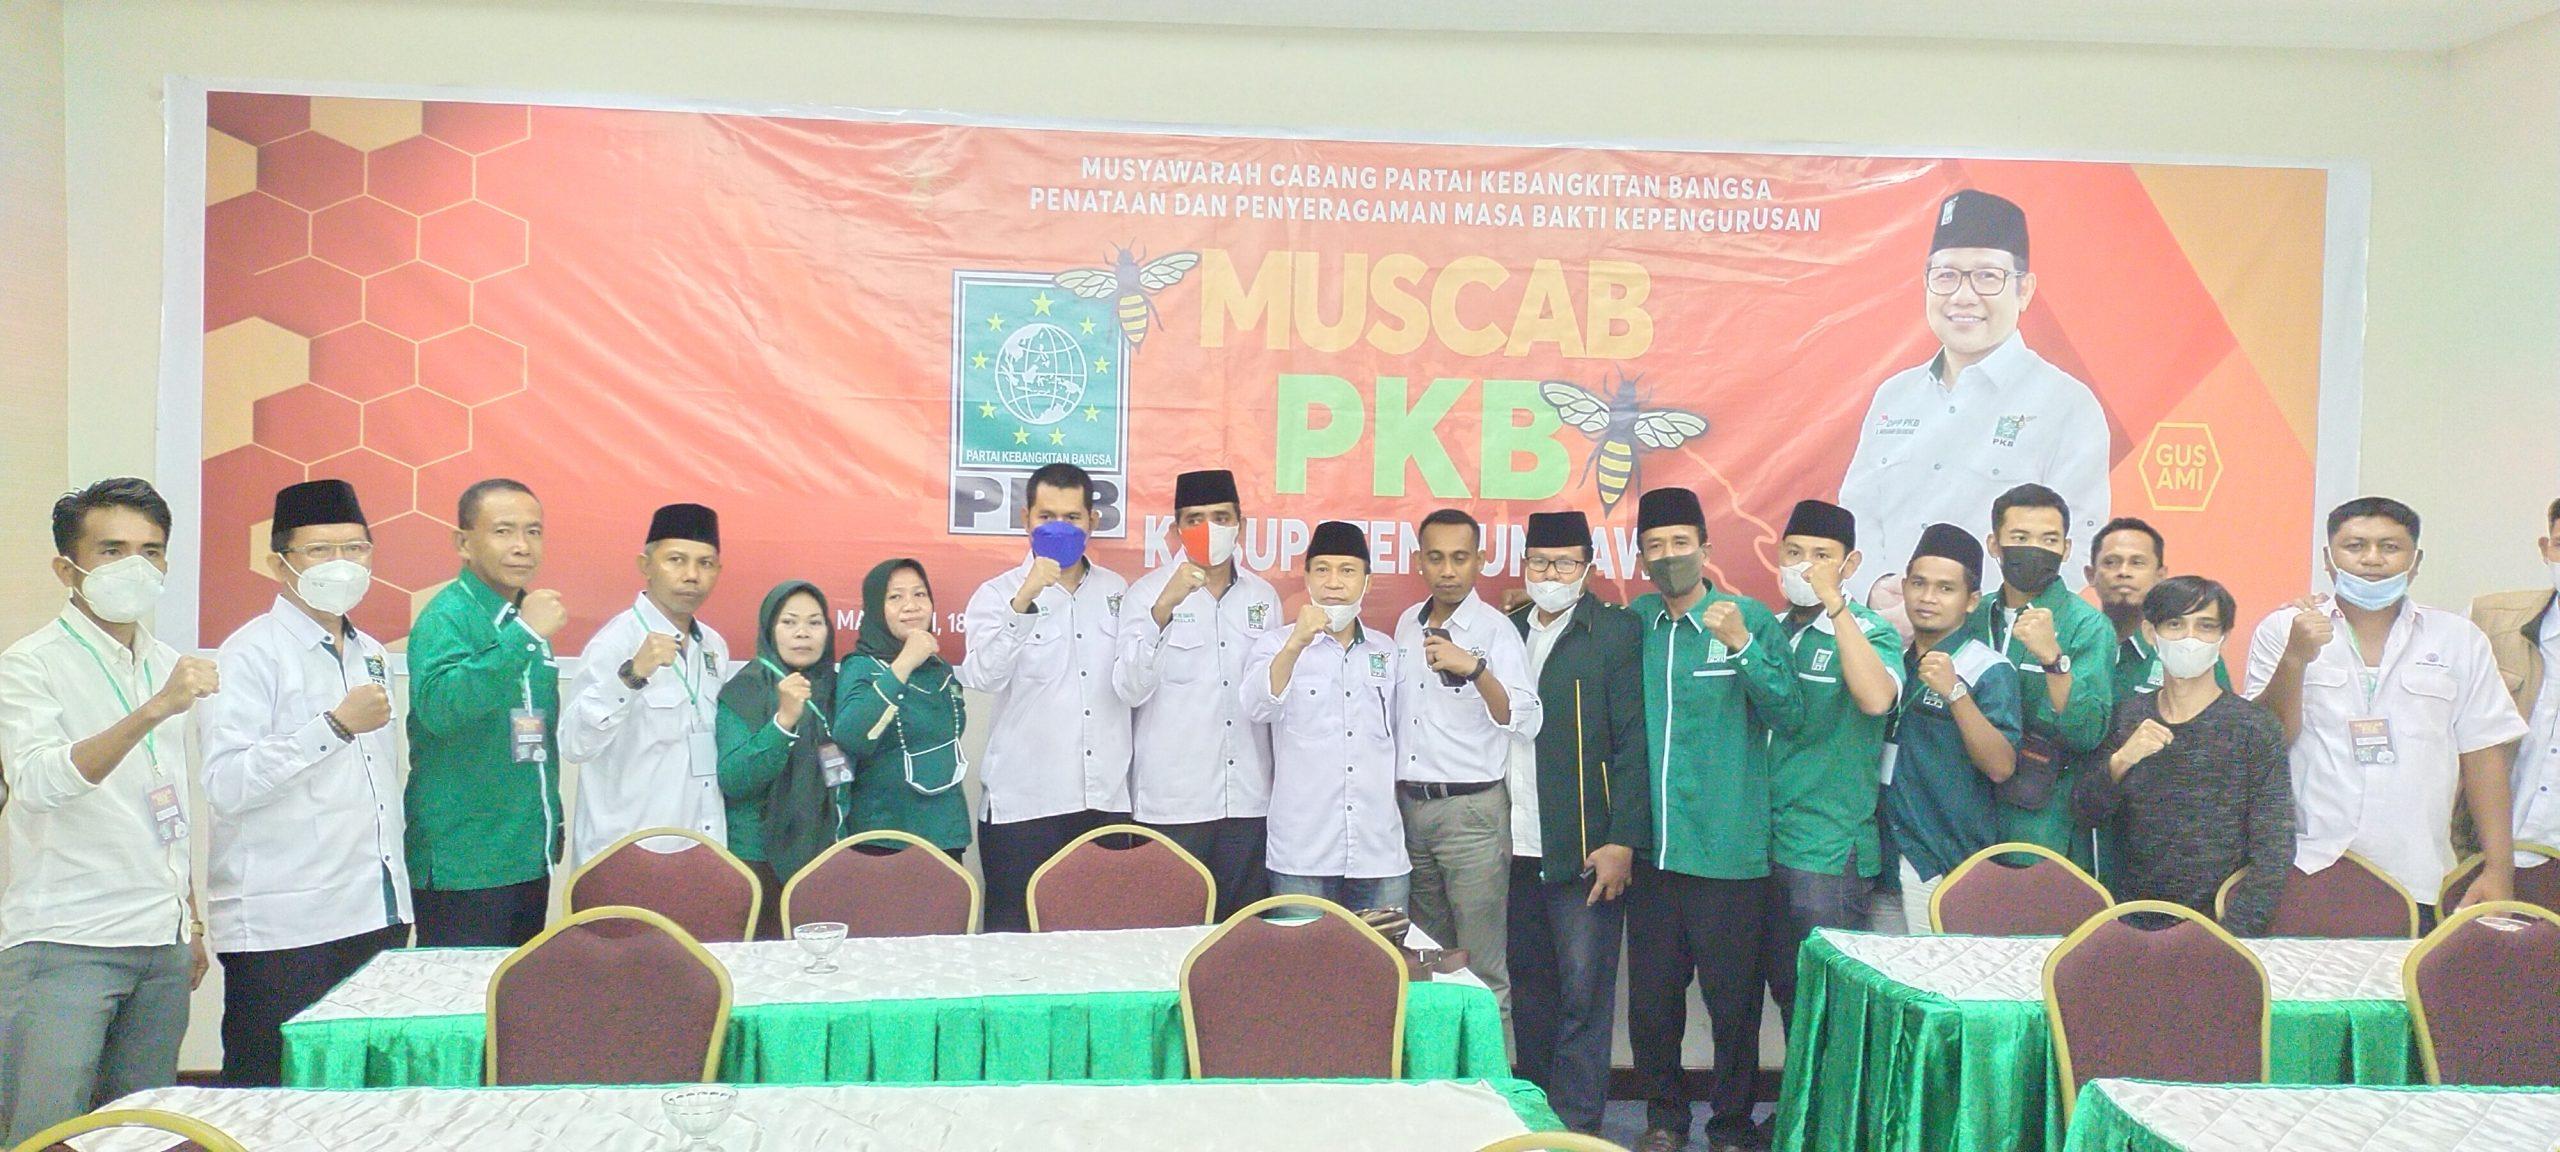 H. Ilham Mustami Pimpin PKB Sumbawa